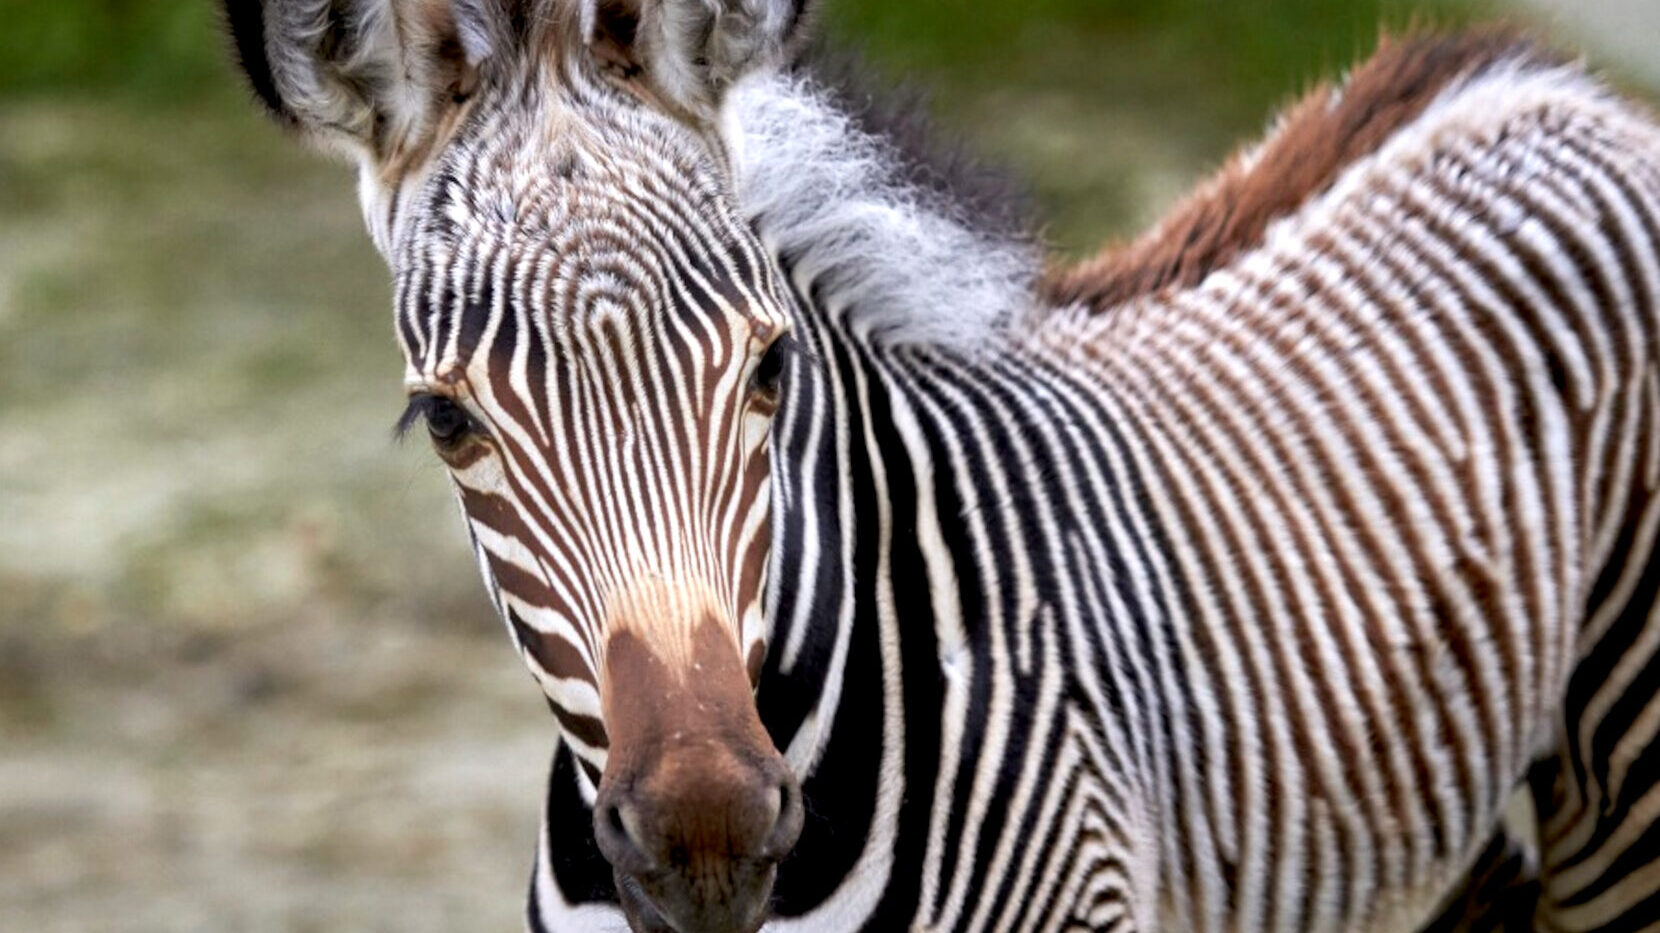 VIDEO: Precious Trot: Endangered Zebra Born in Zoo